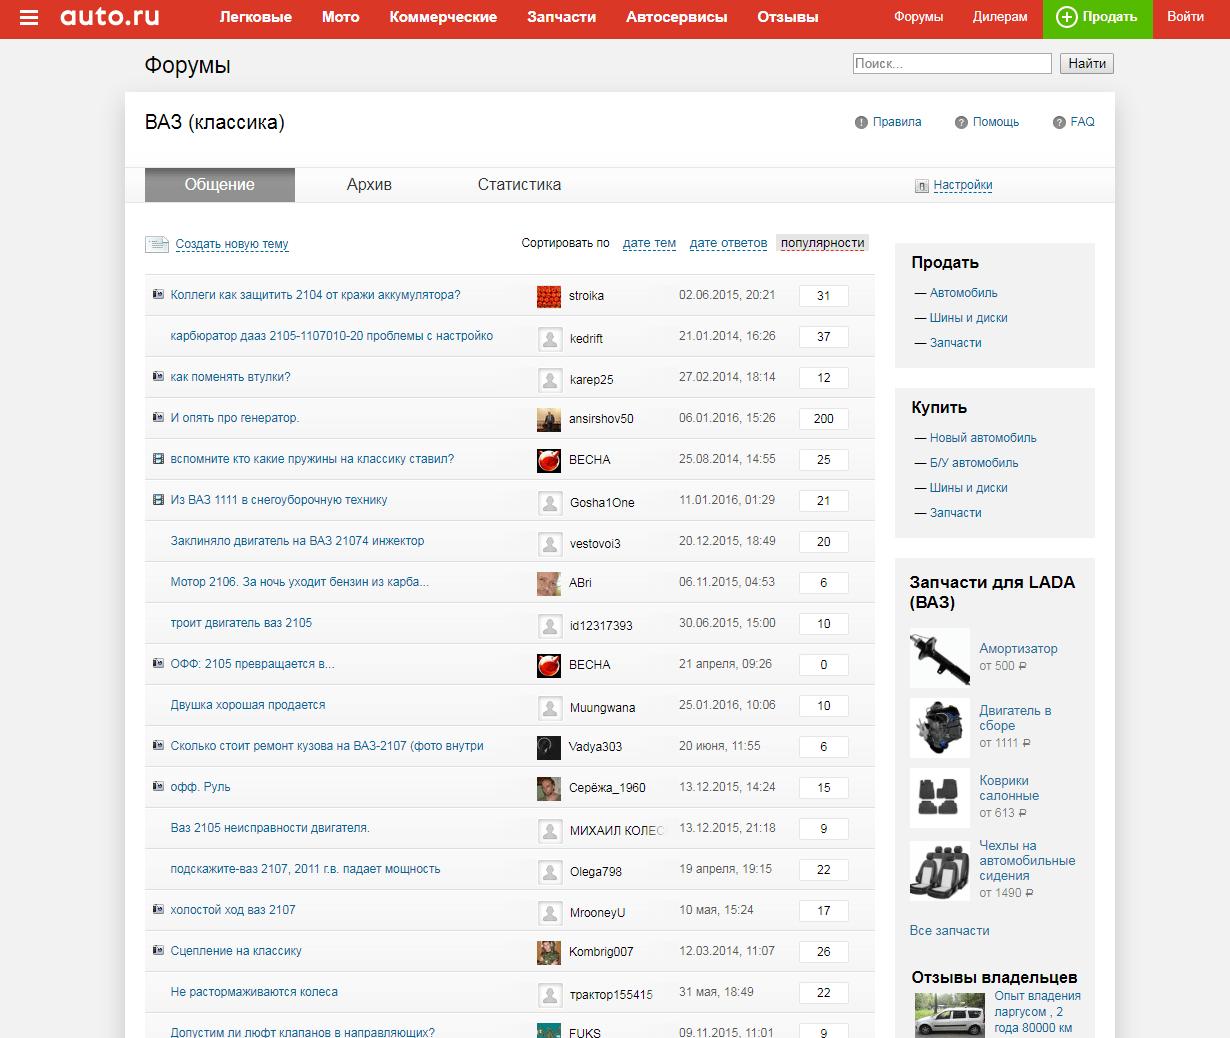 Скриншот сайта auto.ru